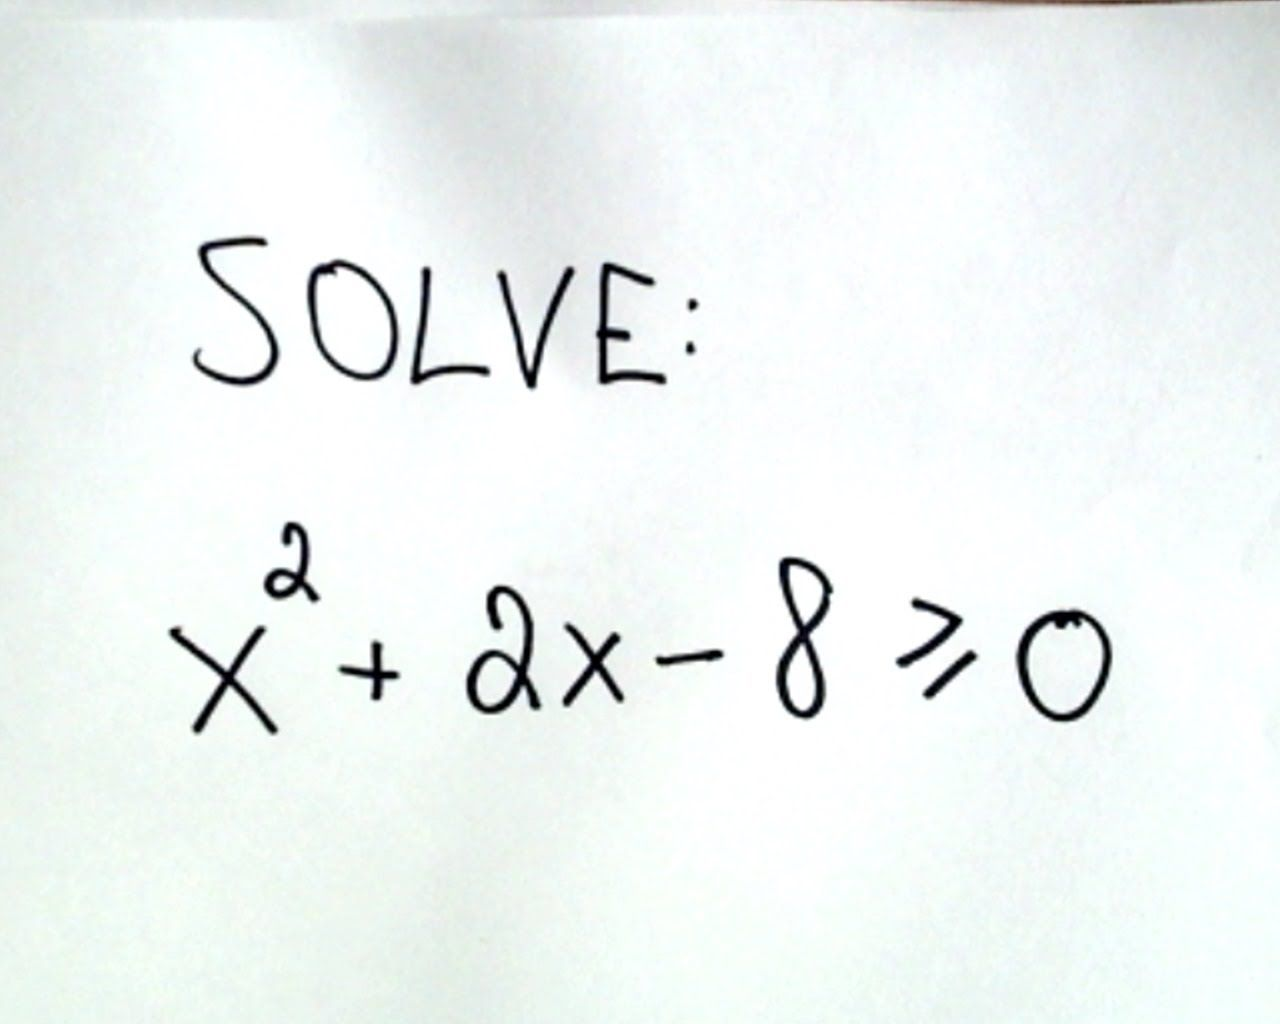 Solving Quadratic Inequalities Math Practice Worksheets Quadratics Algebra Worksheets